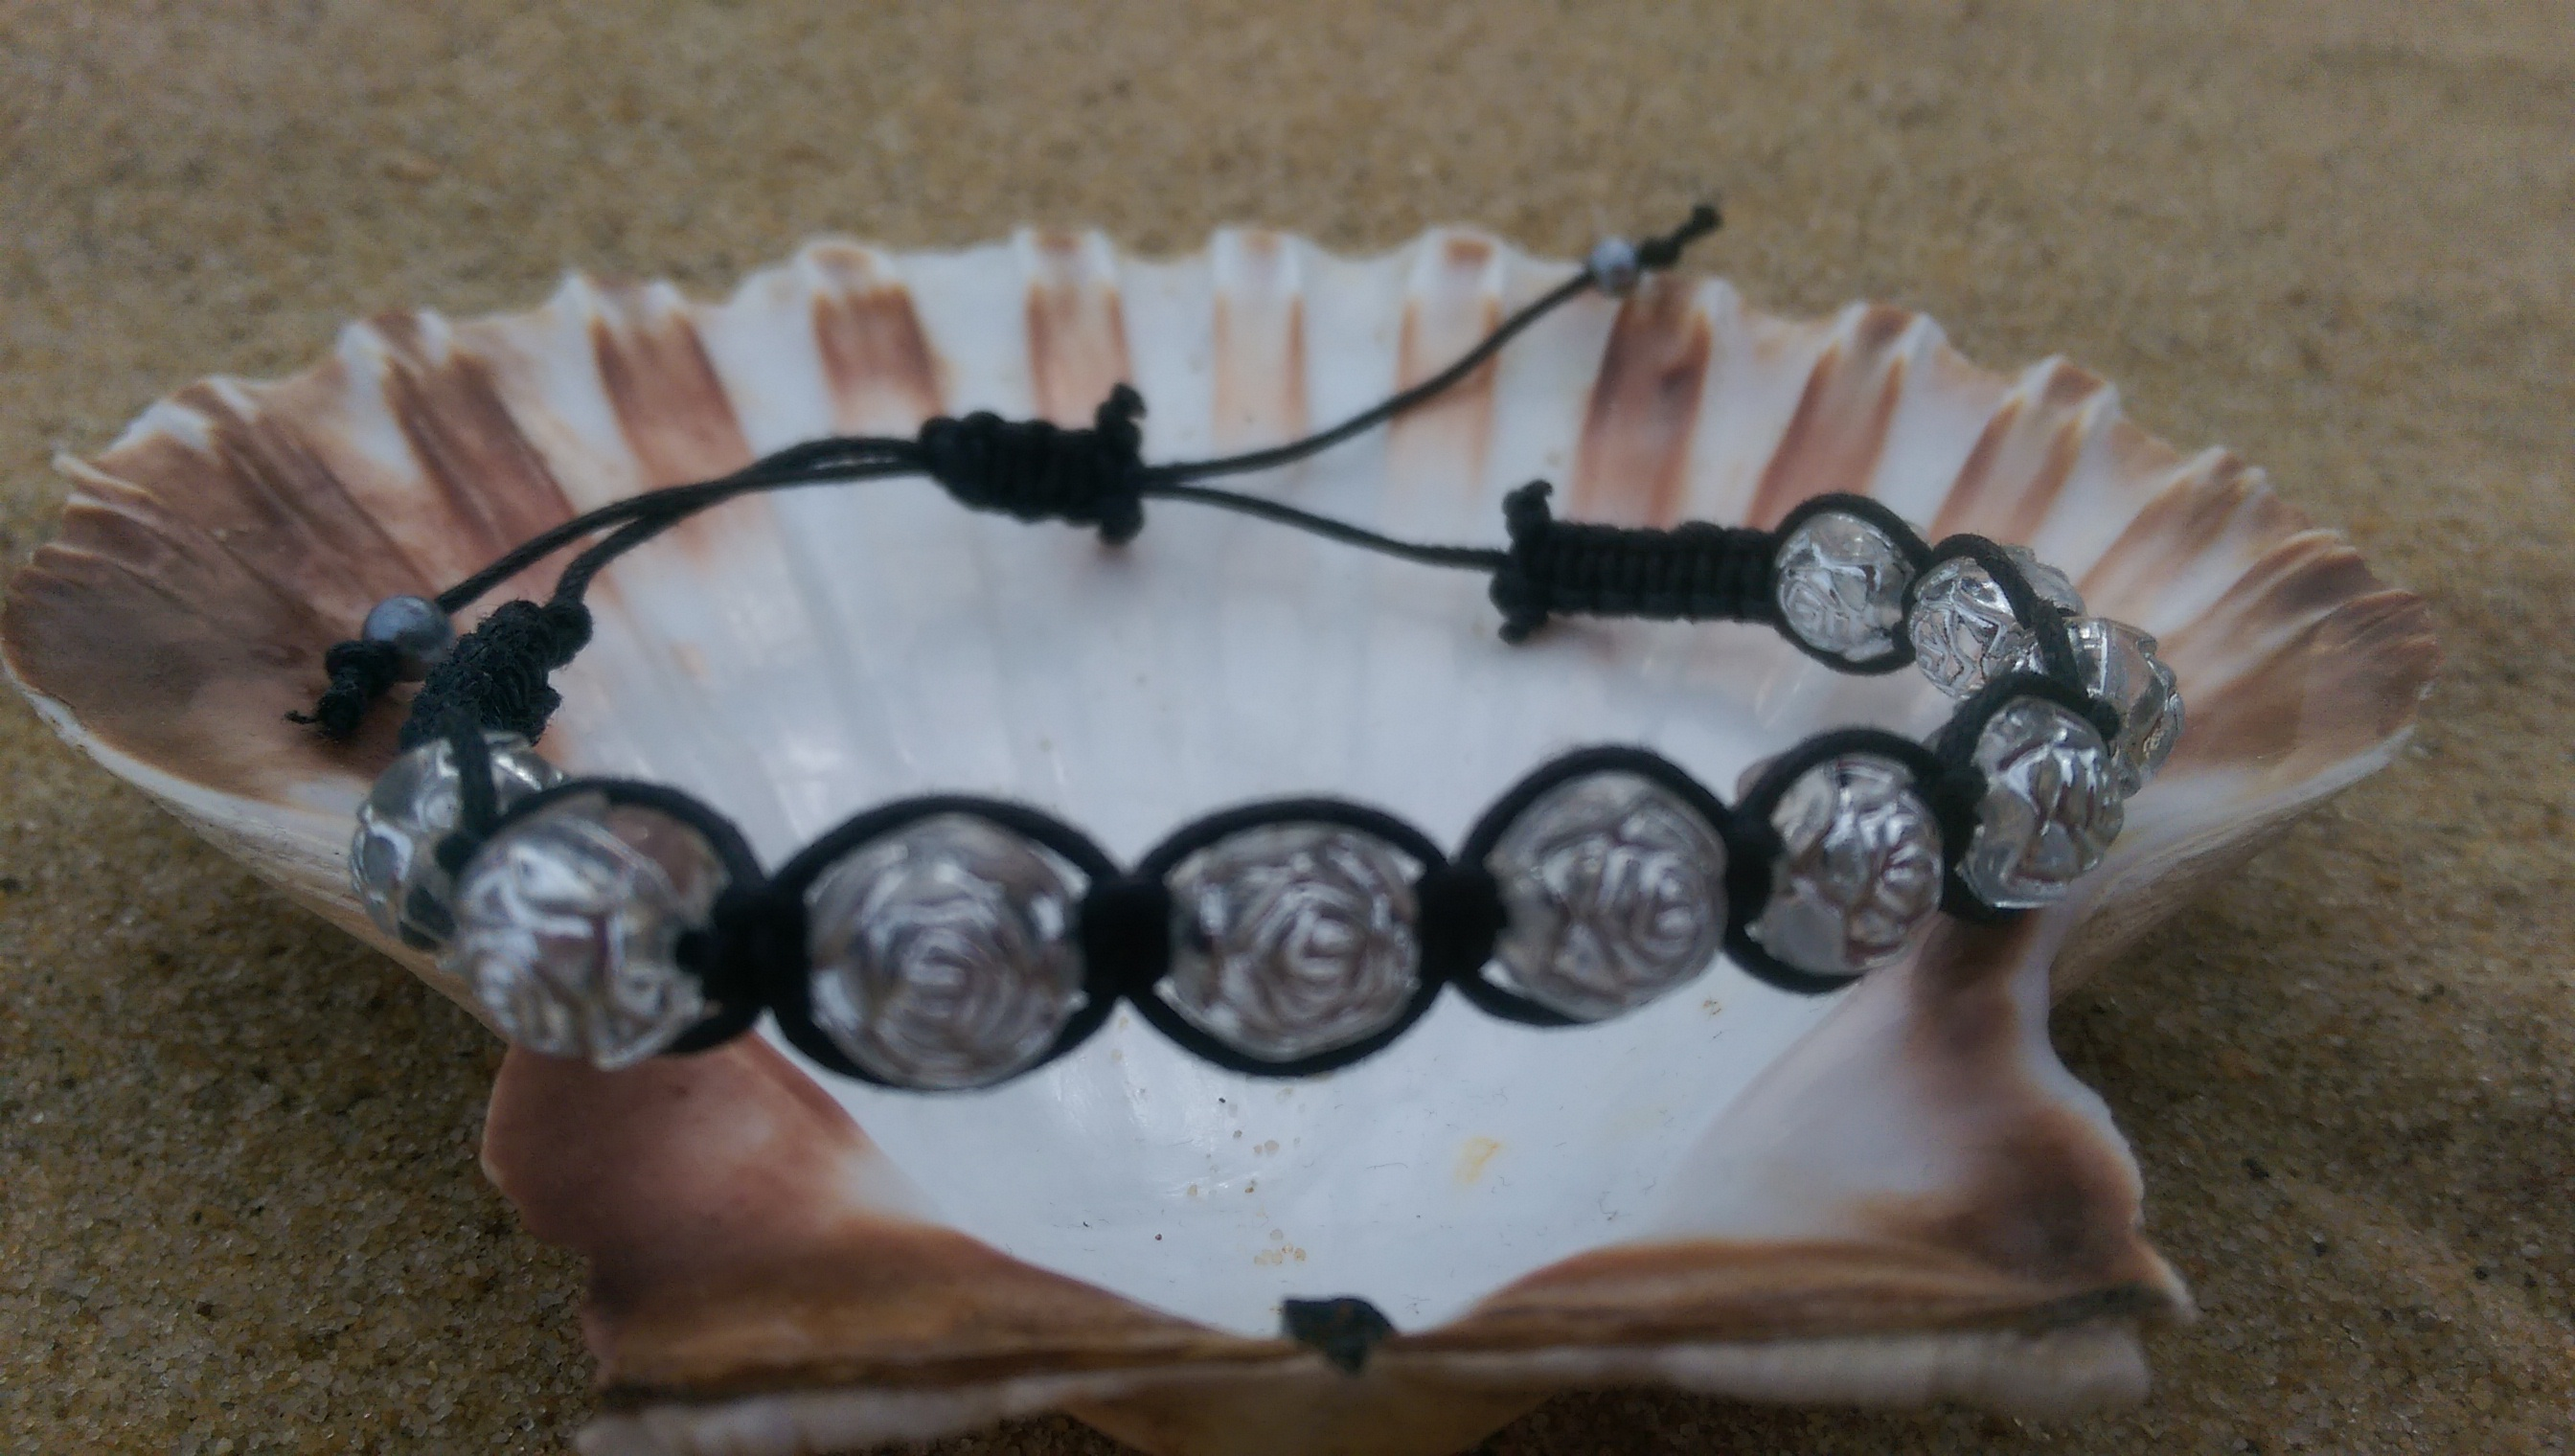 Silver rose shamballa-style